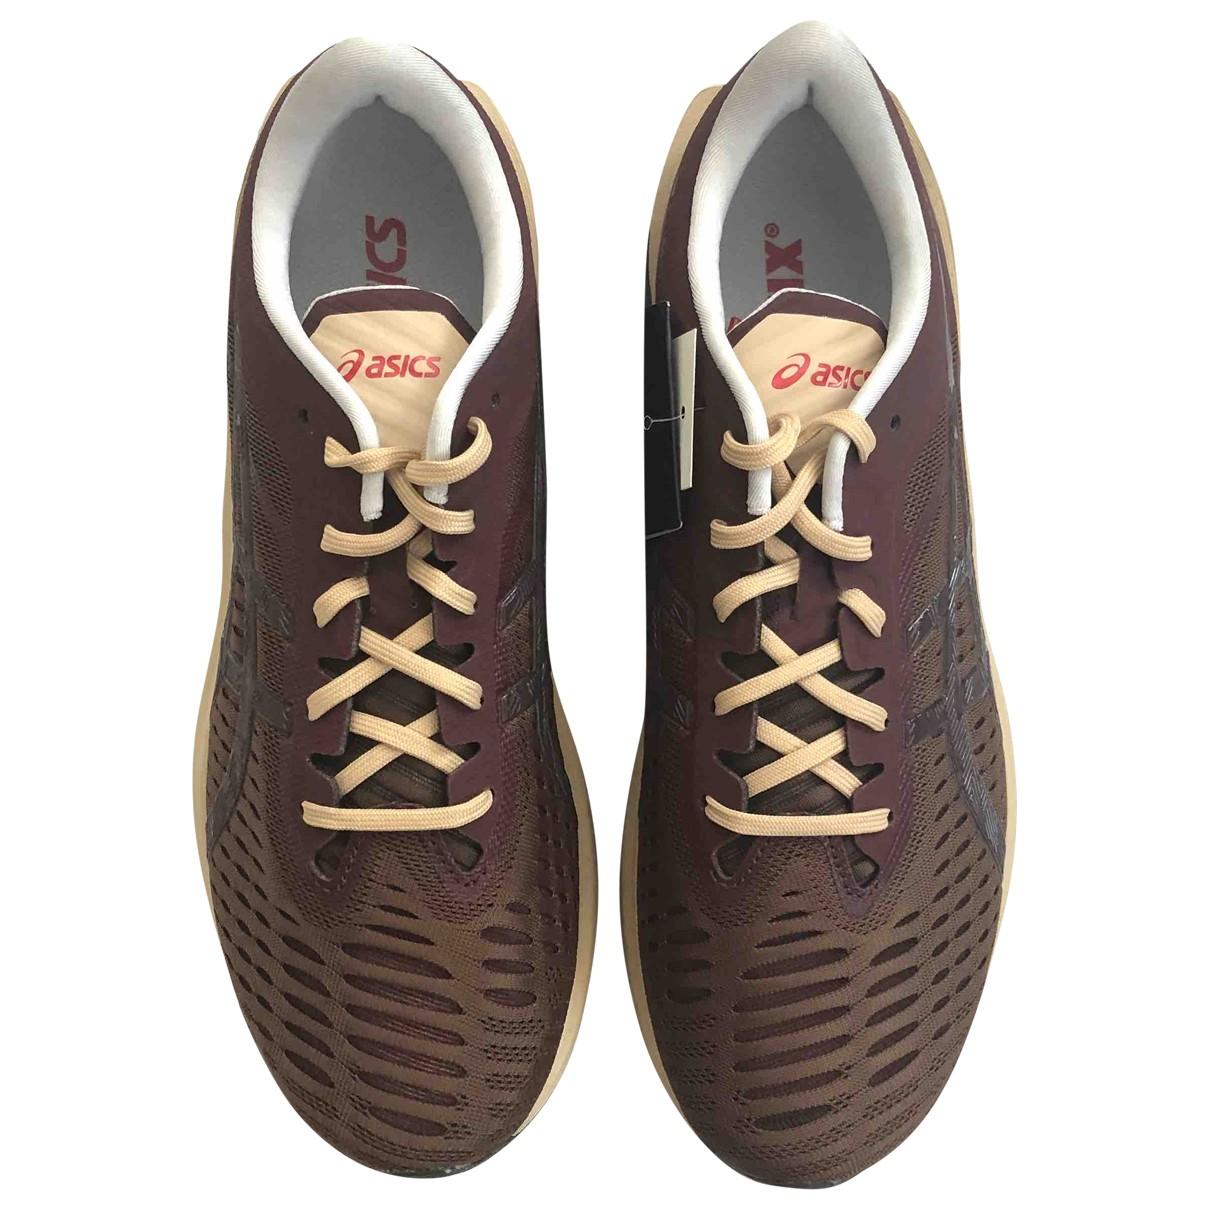 Asics X Kiko Kostadinov \N Sneakers in  Braun Kunststoff